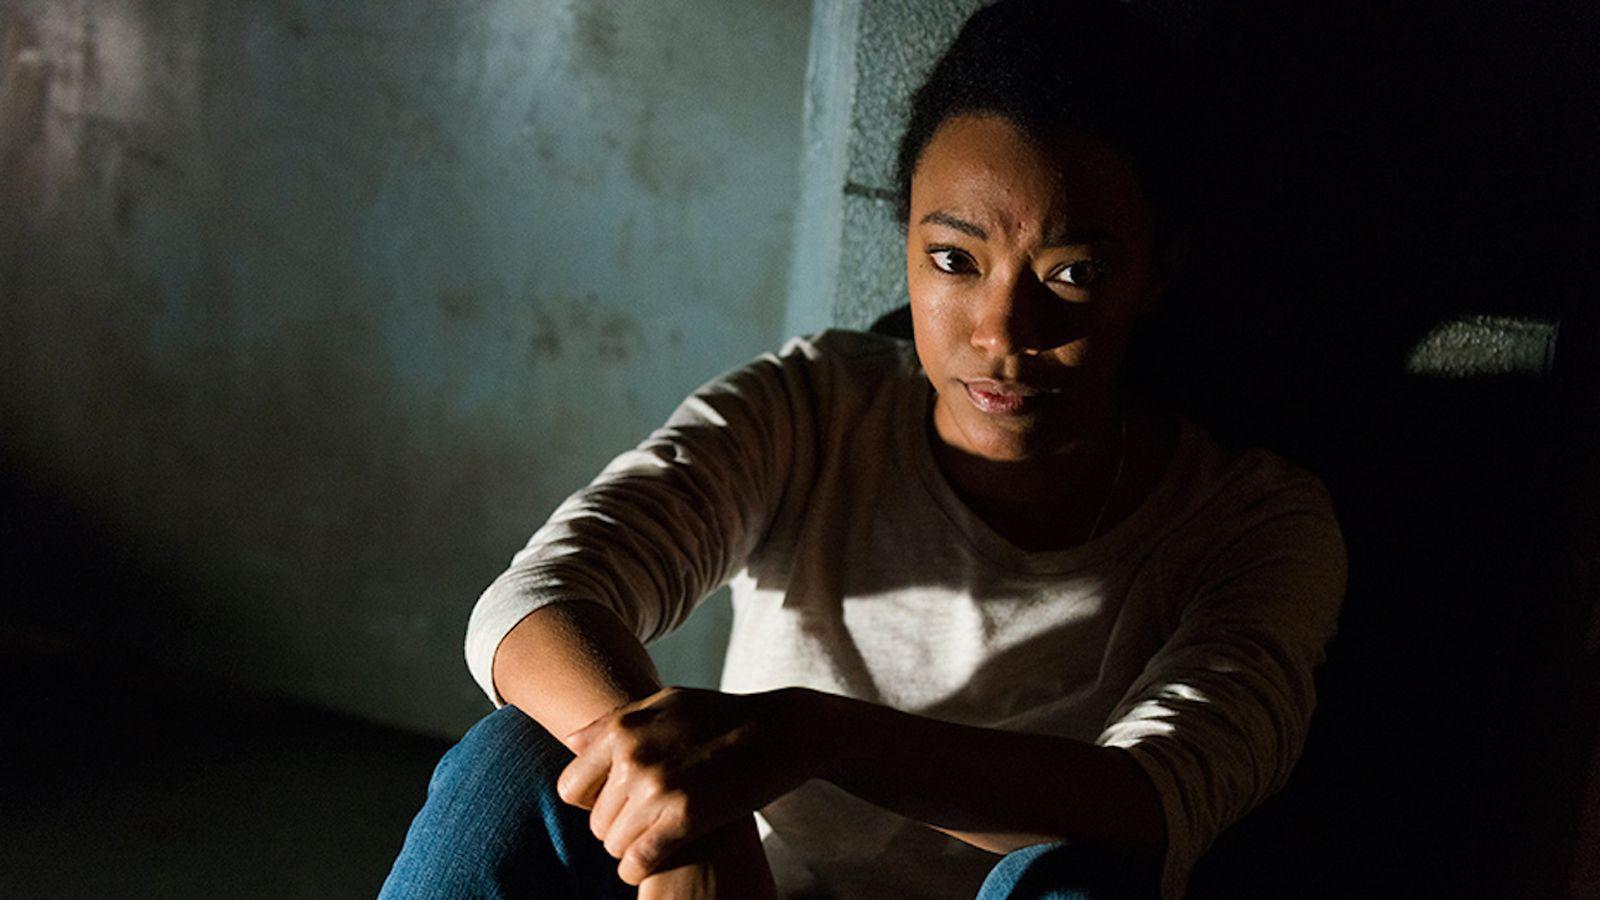 Sonequa Martin-Green as Sasha Williams sitting on the floor in a dark room on The Walking Dead